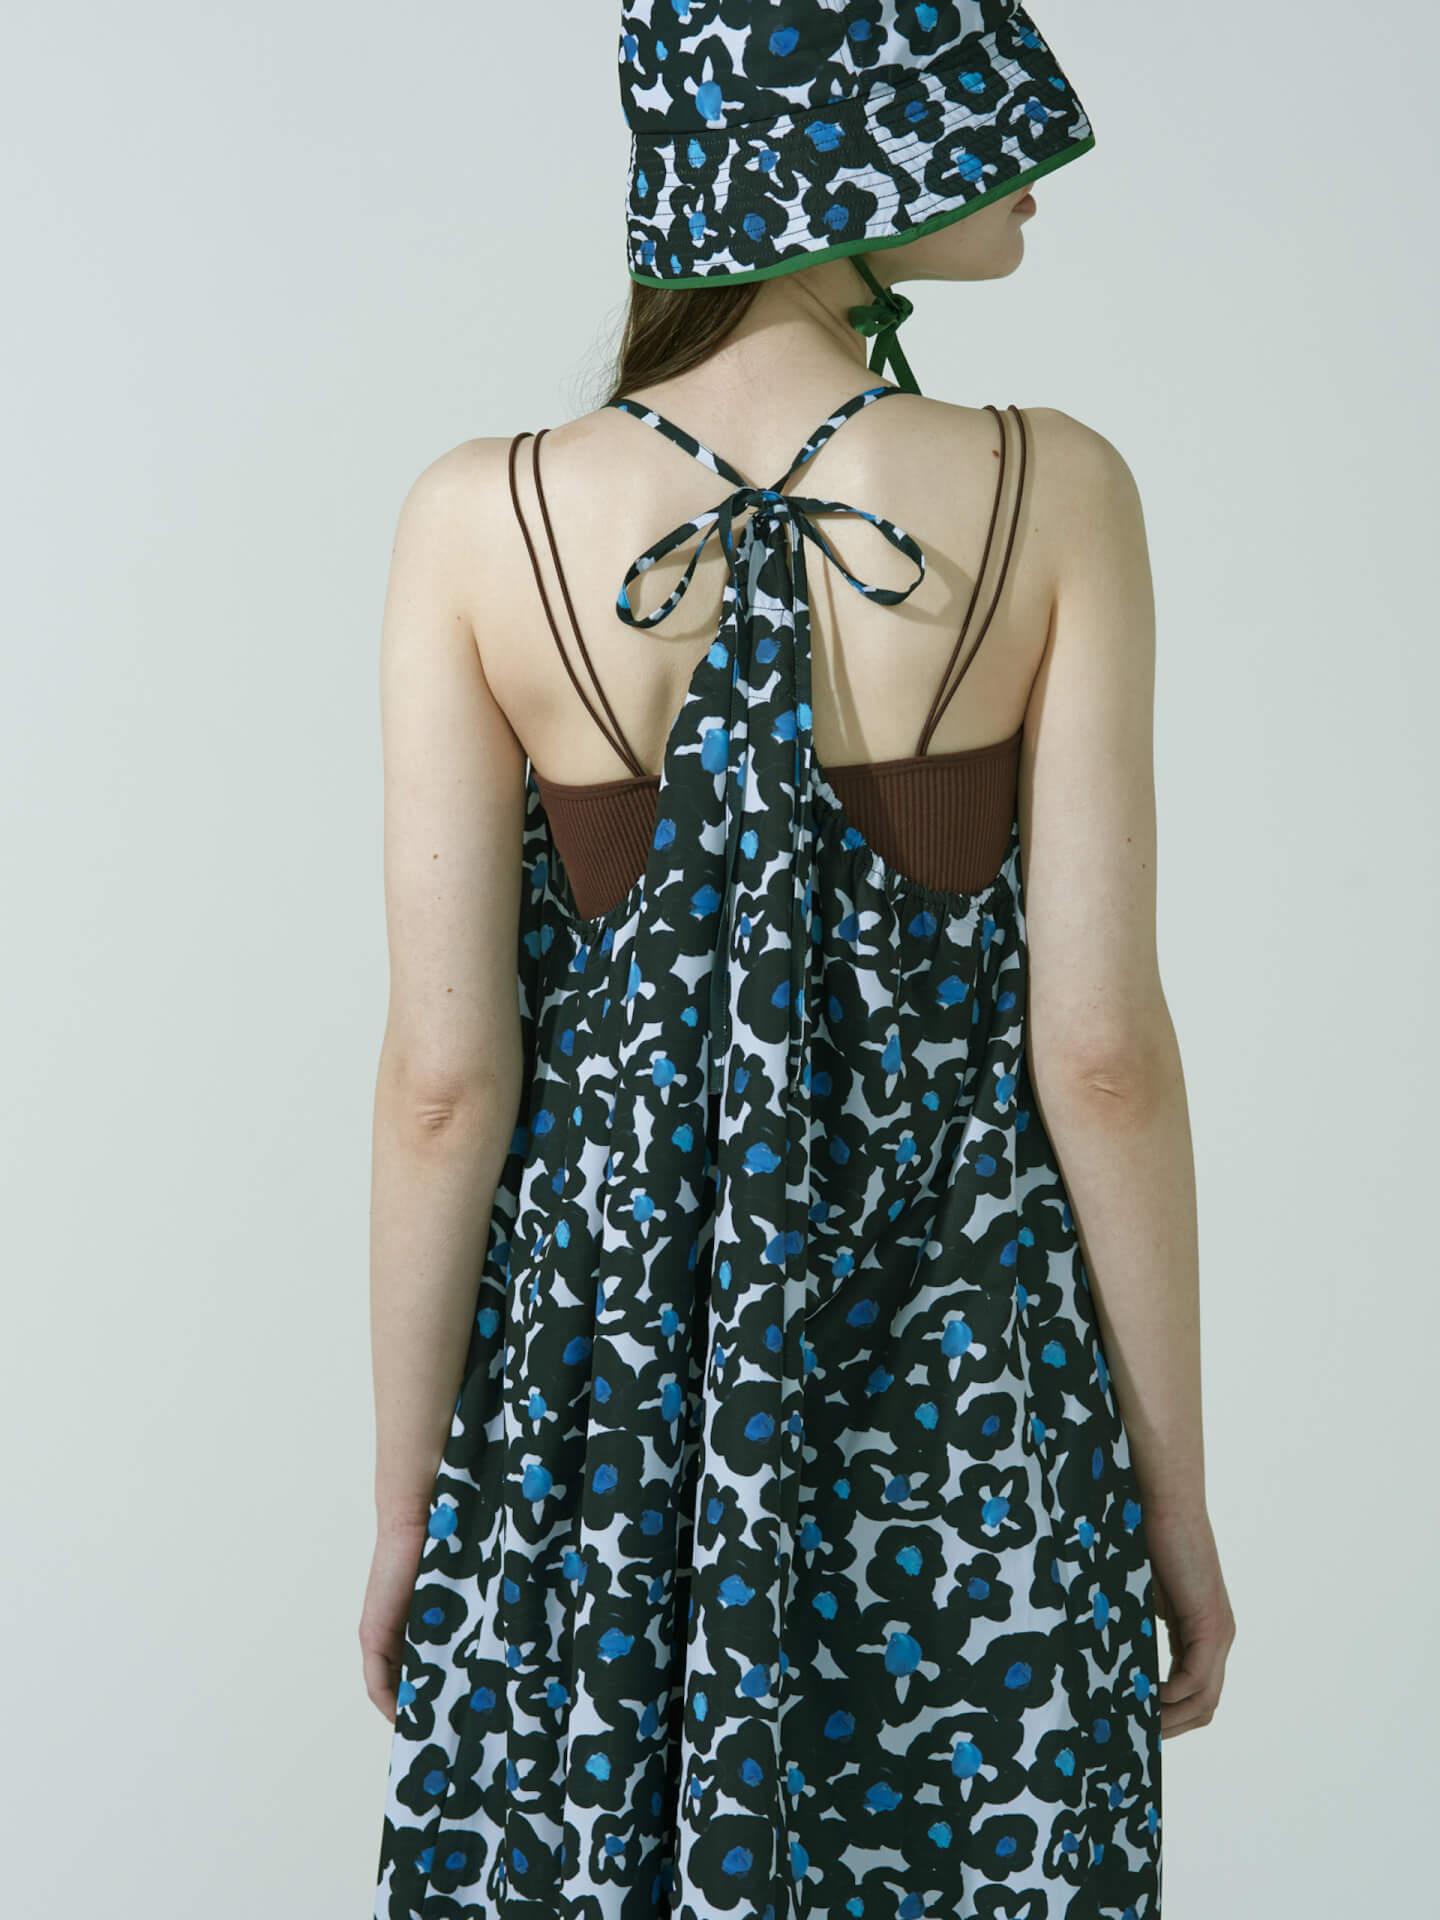 CHAIのベーシスト・YUUKIによるプロジェクト「YMYM」よりファッションブランドオープン!2021年春夏コレクション&描き下ろし絵画などの展示会も life210405_ymym_14